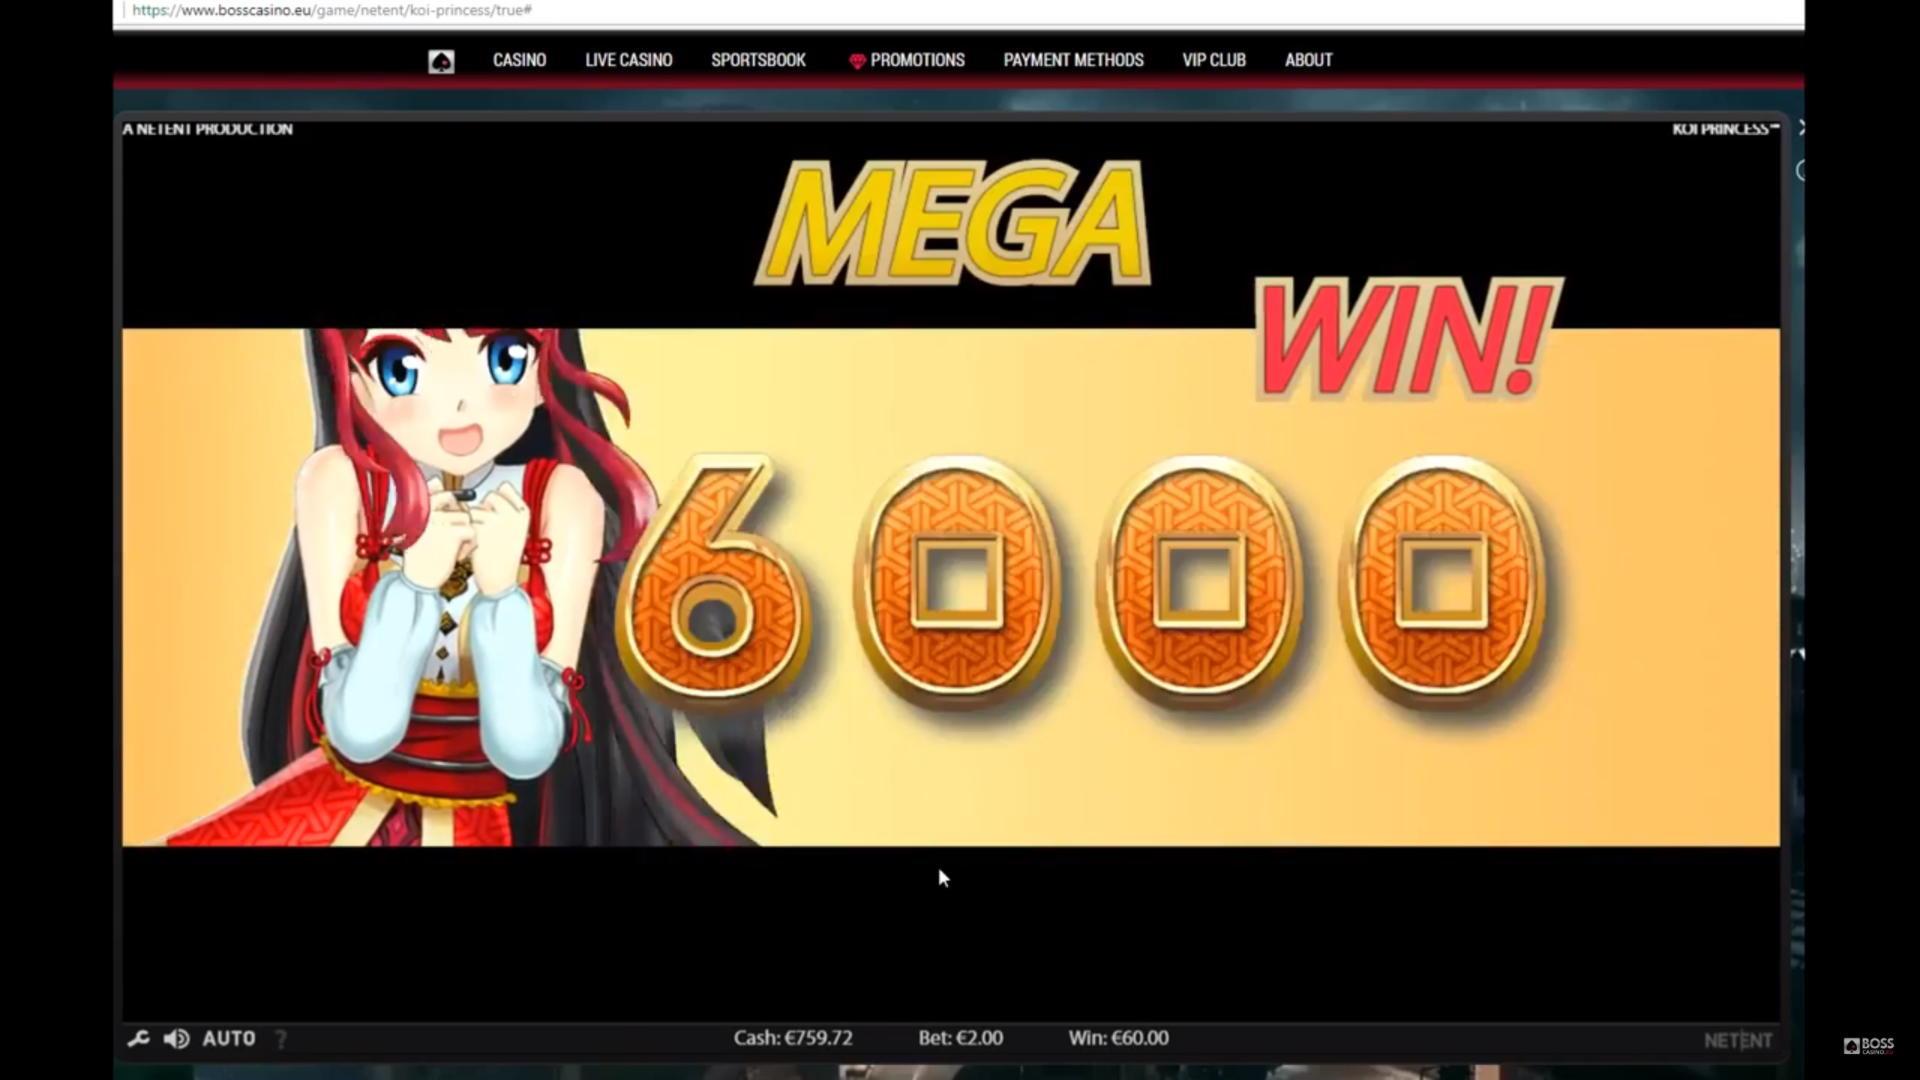 970% casino match bonus at Bet At Home